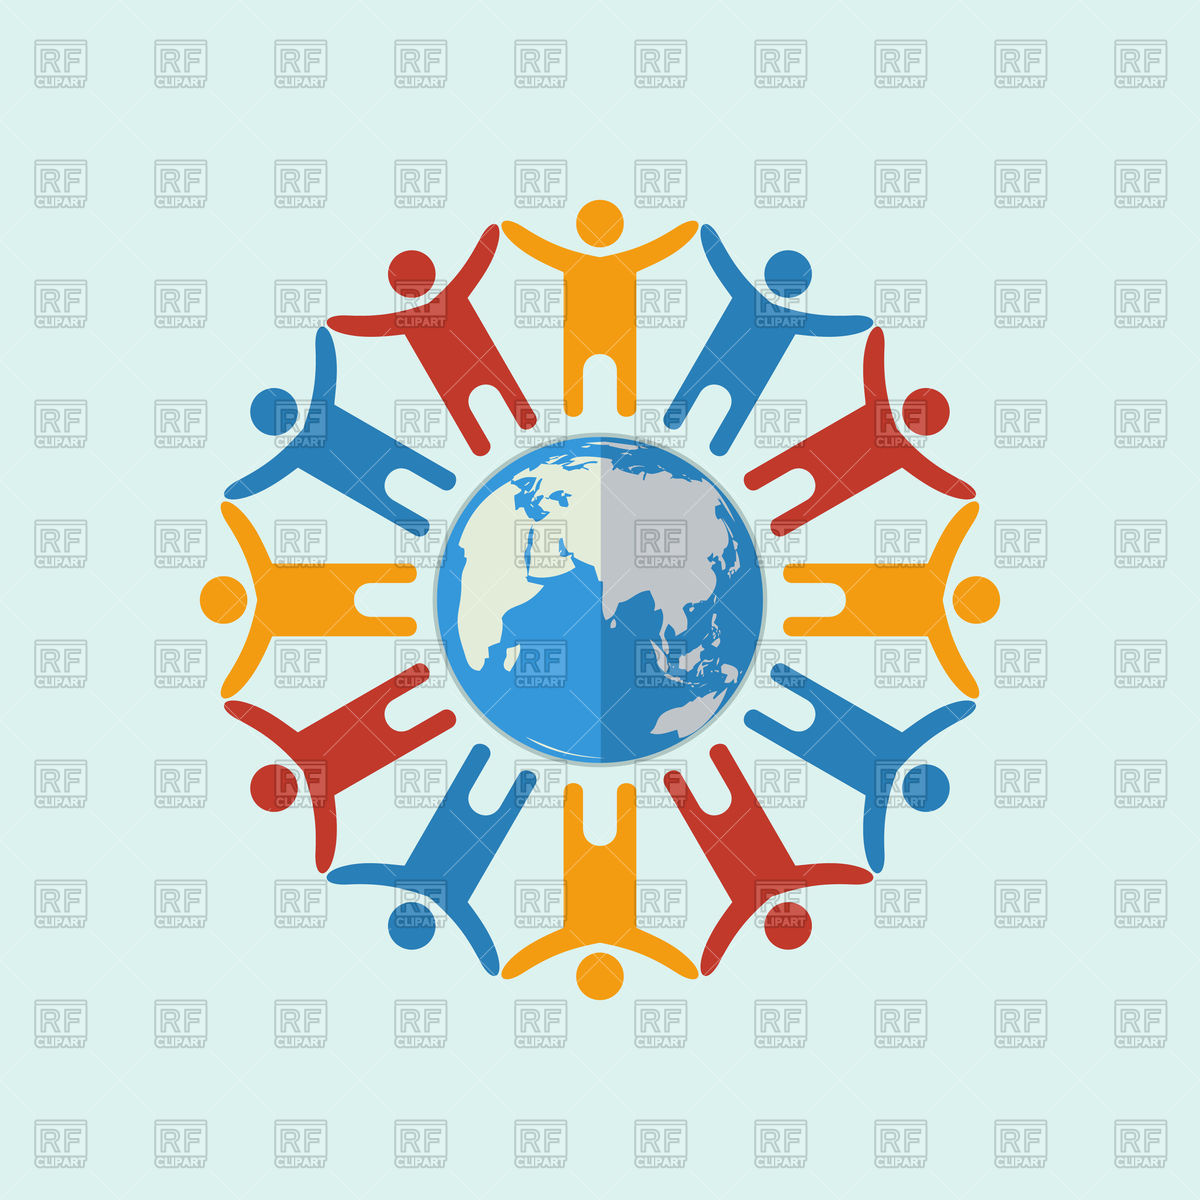 People around the world icon Vector Image #79170.